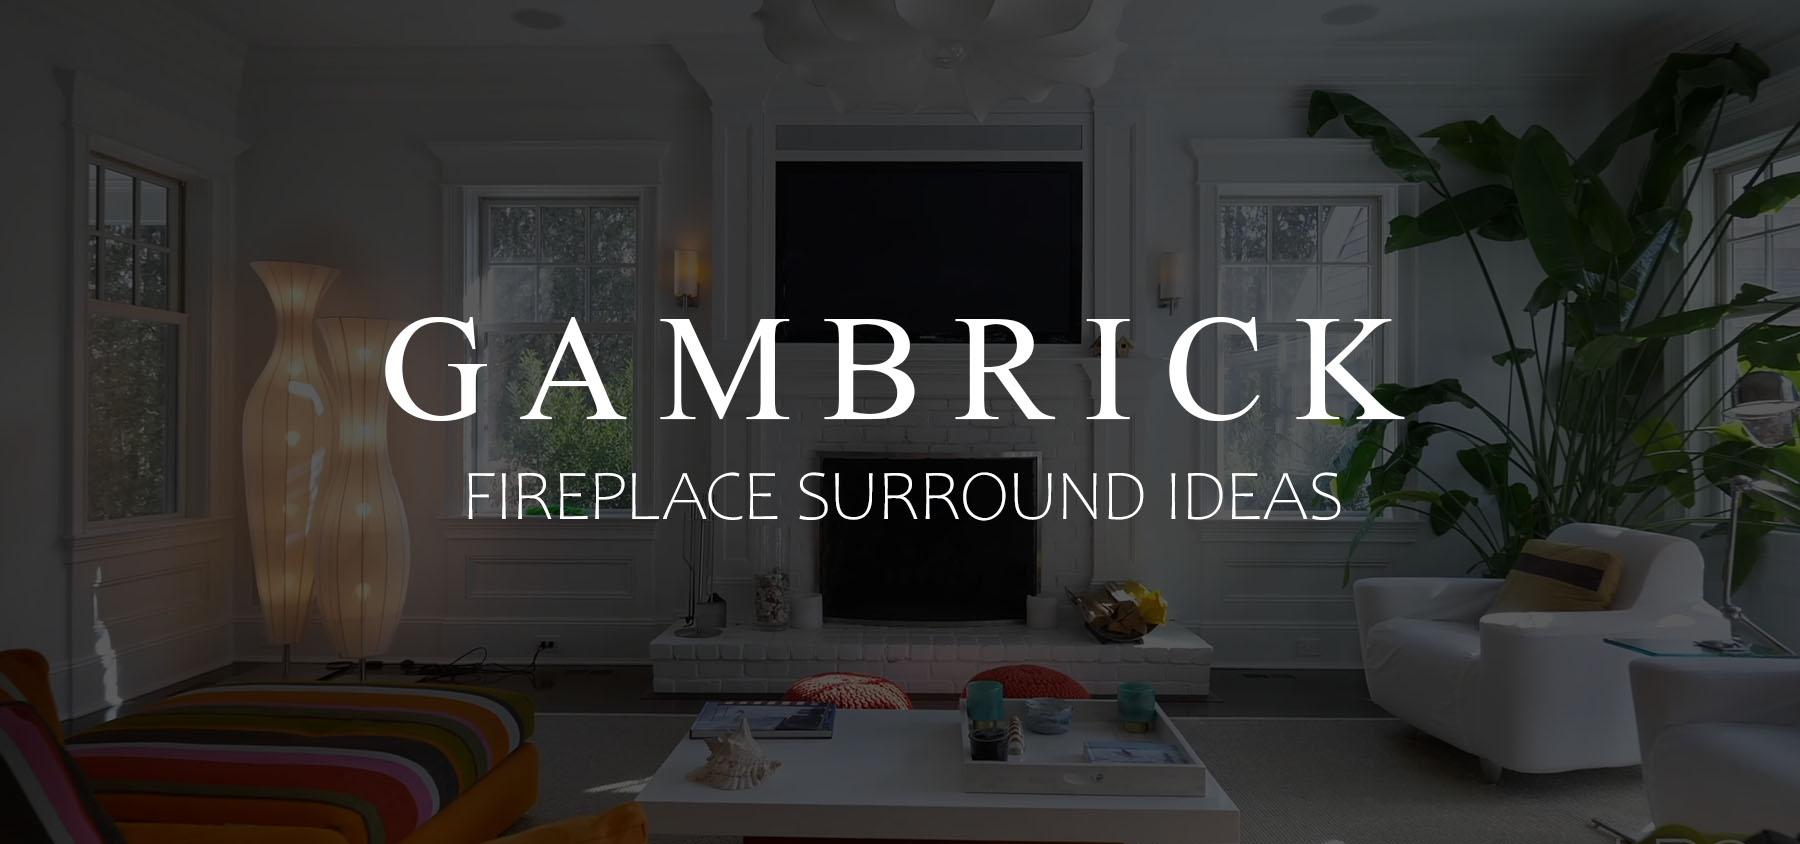 Best Fireplace Surround Ideas Mantel Designs Ideas